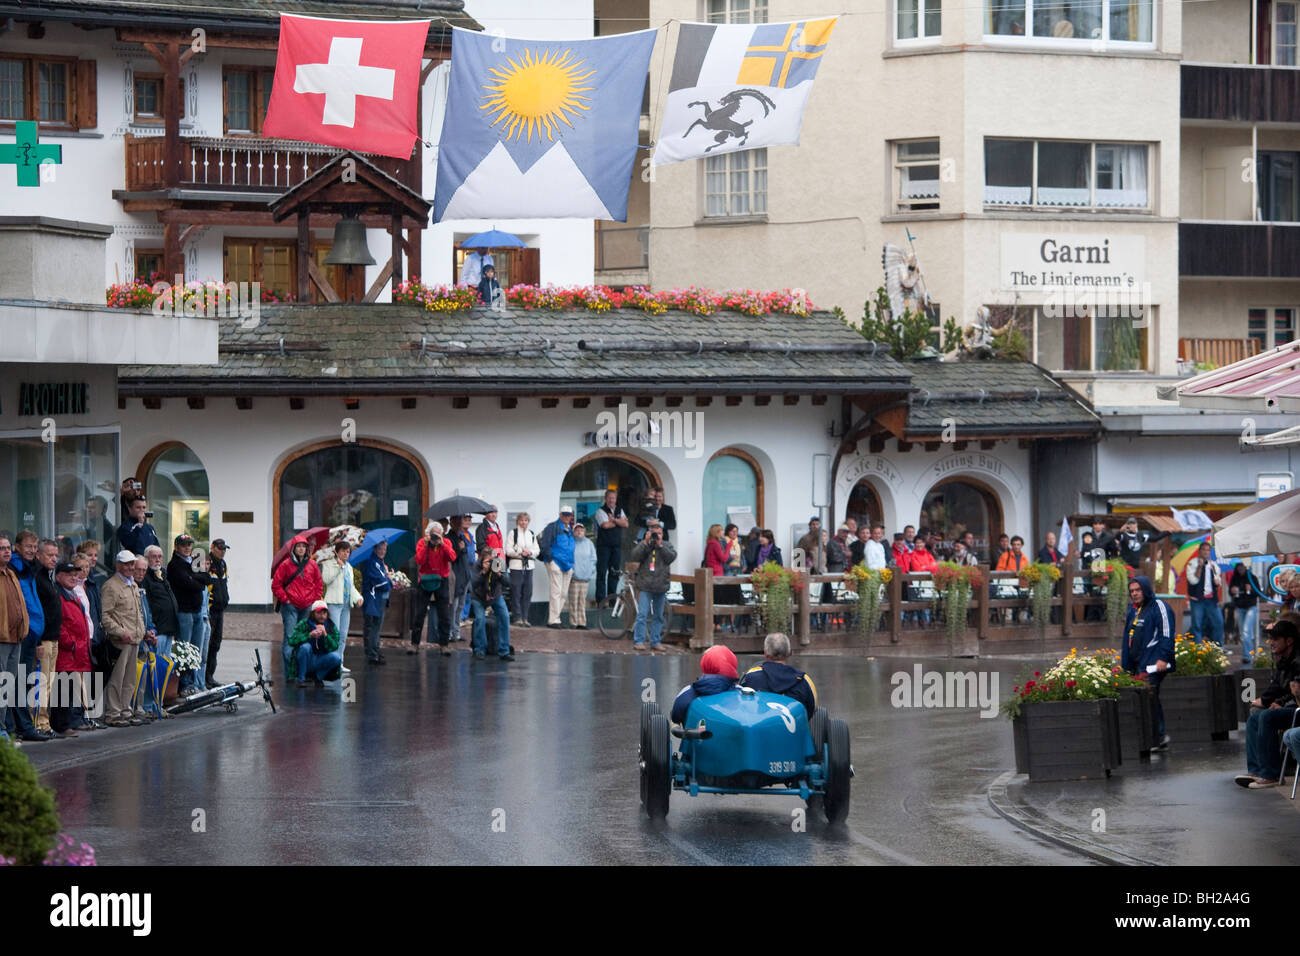 OLDTIMER, CLASSICCAR HILL CLIMB, CAR RACING, AROSA, GRISONS, SWITZERLAND - Stock Image